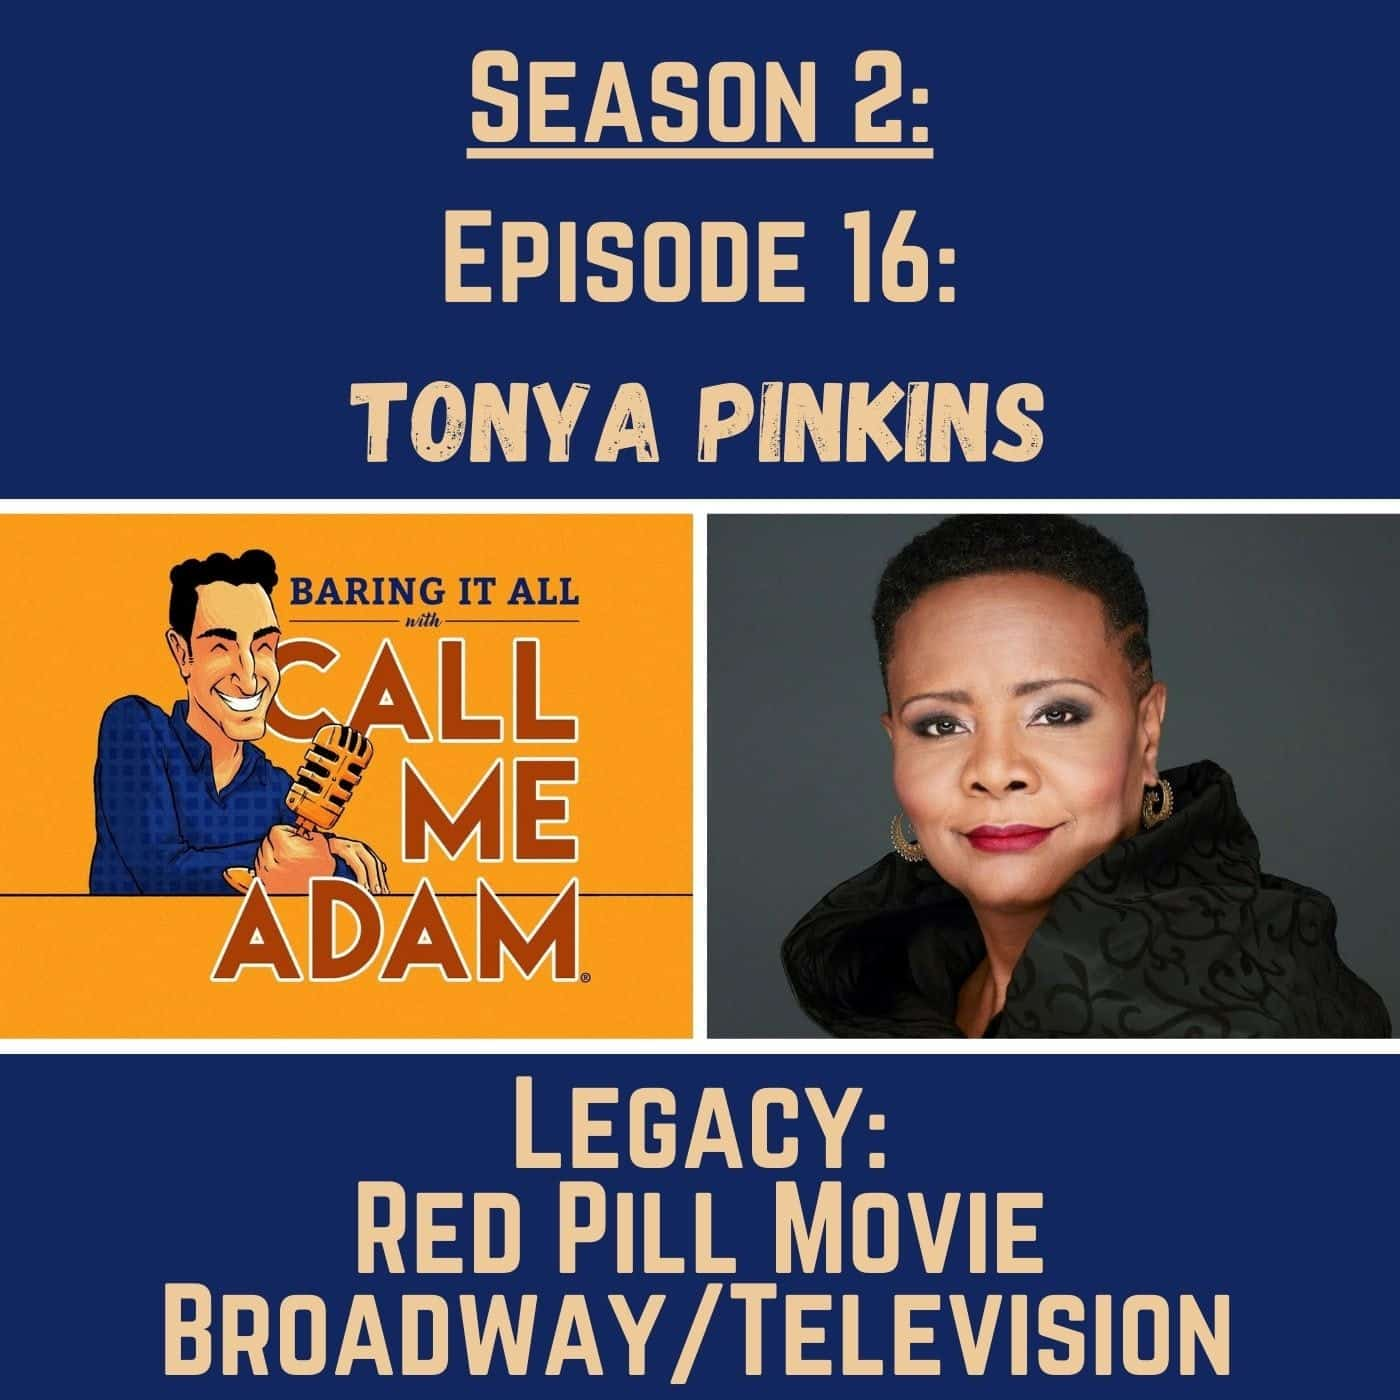 Season 2: Episode 16: Tonya Pinkins: Tony Award Winner, Red Pill Movie, All My Children, Actress, Podcaster, Filmmaker, Activist, Mother